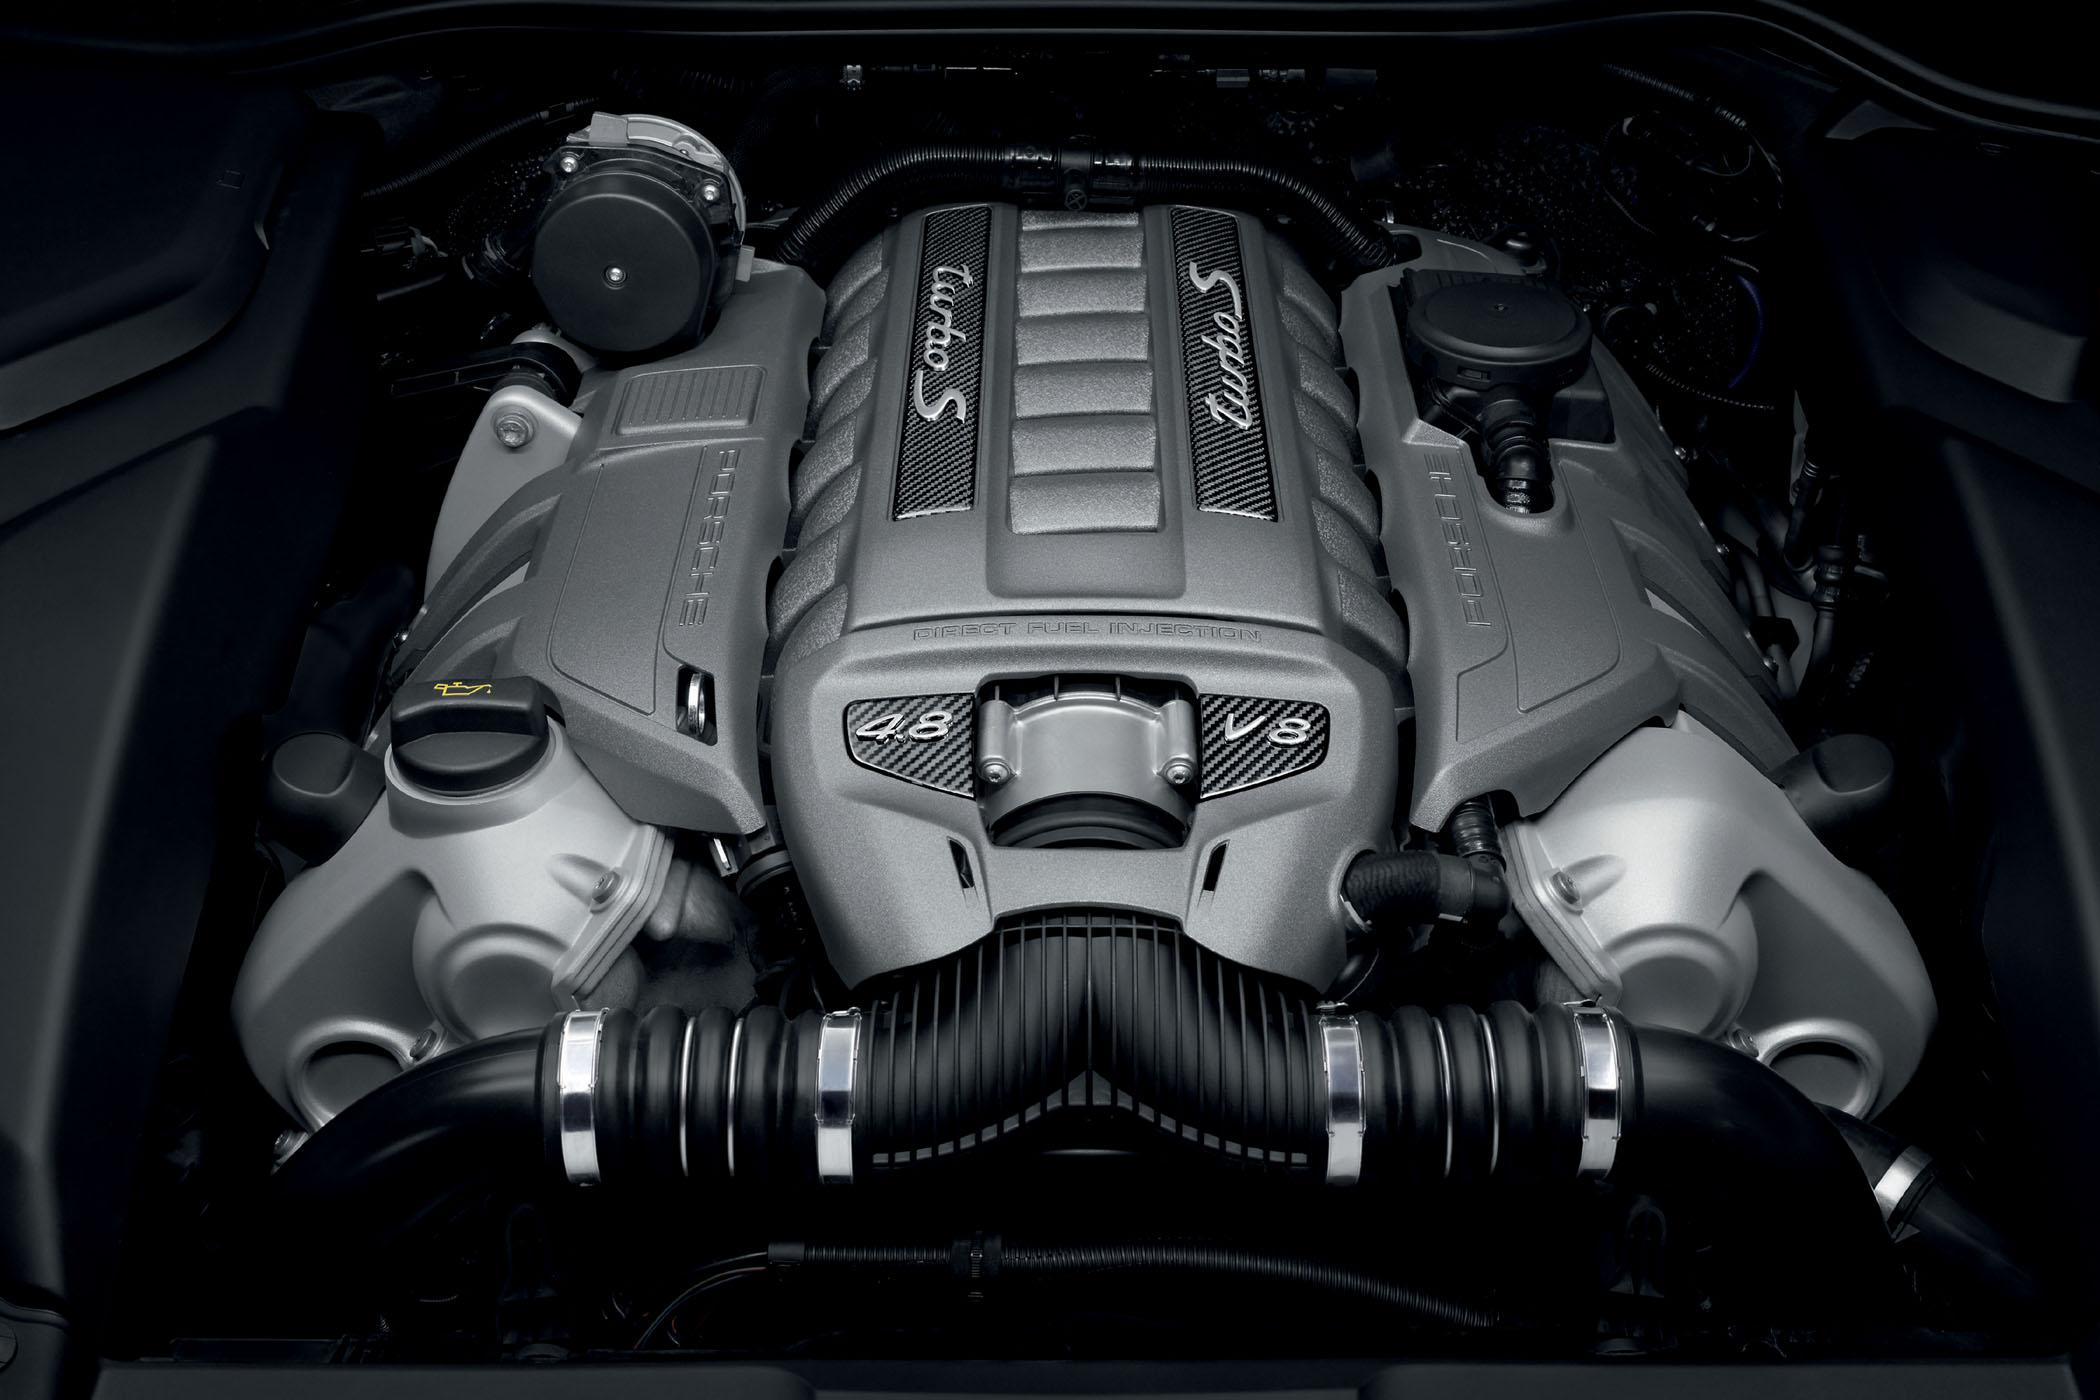 Der V8 verfügt über 4,8 Liter Hubraum